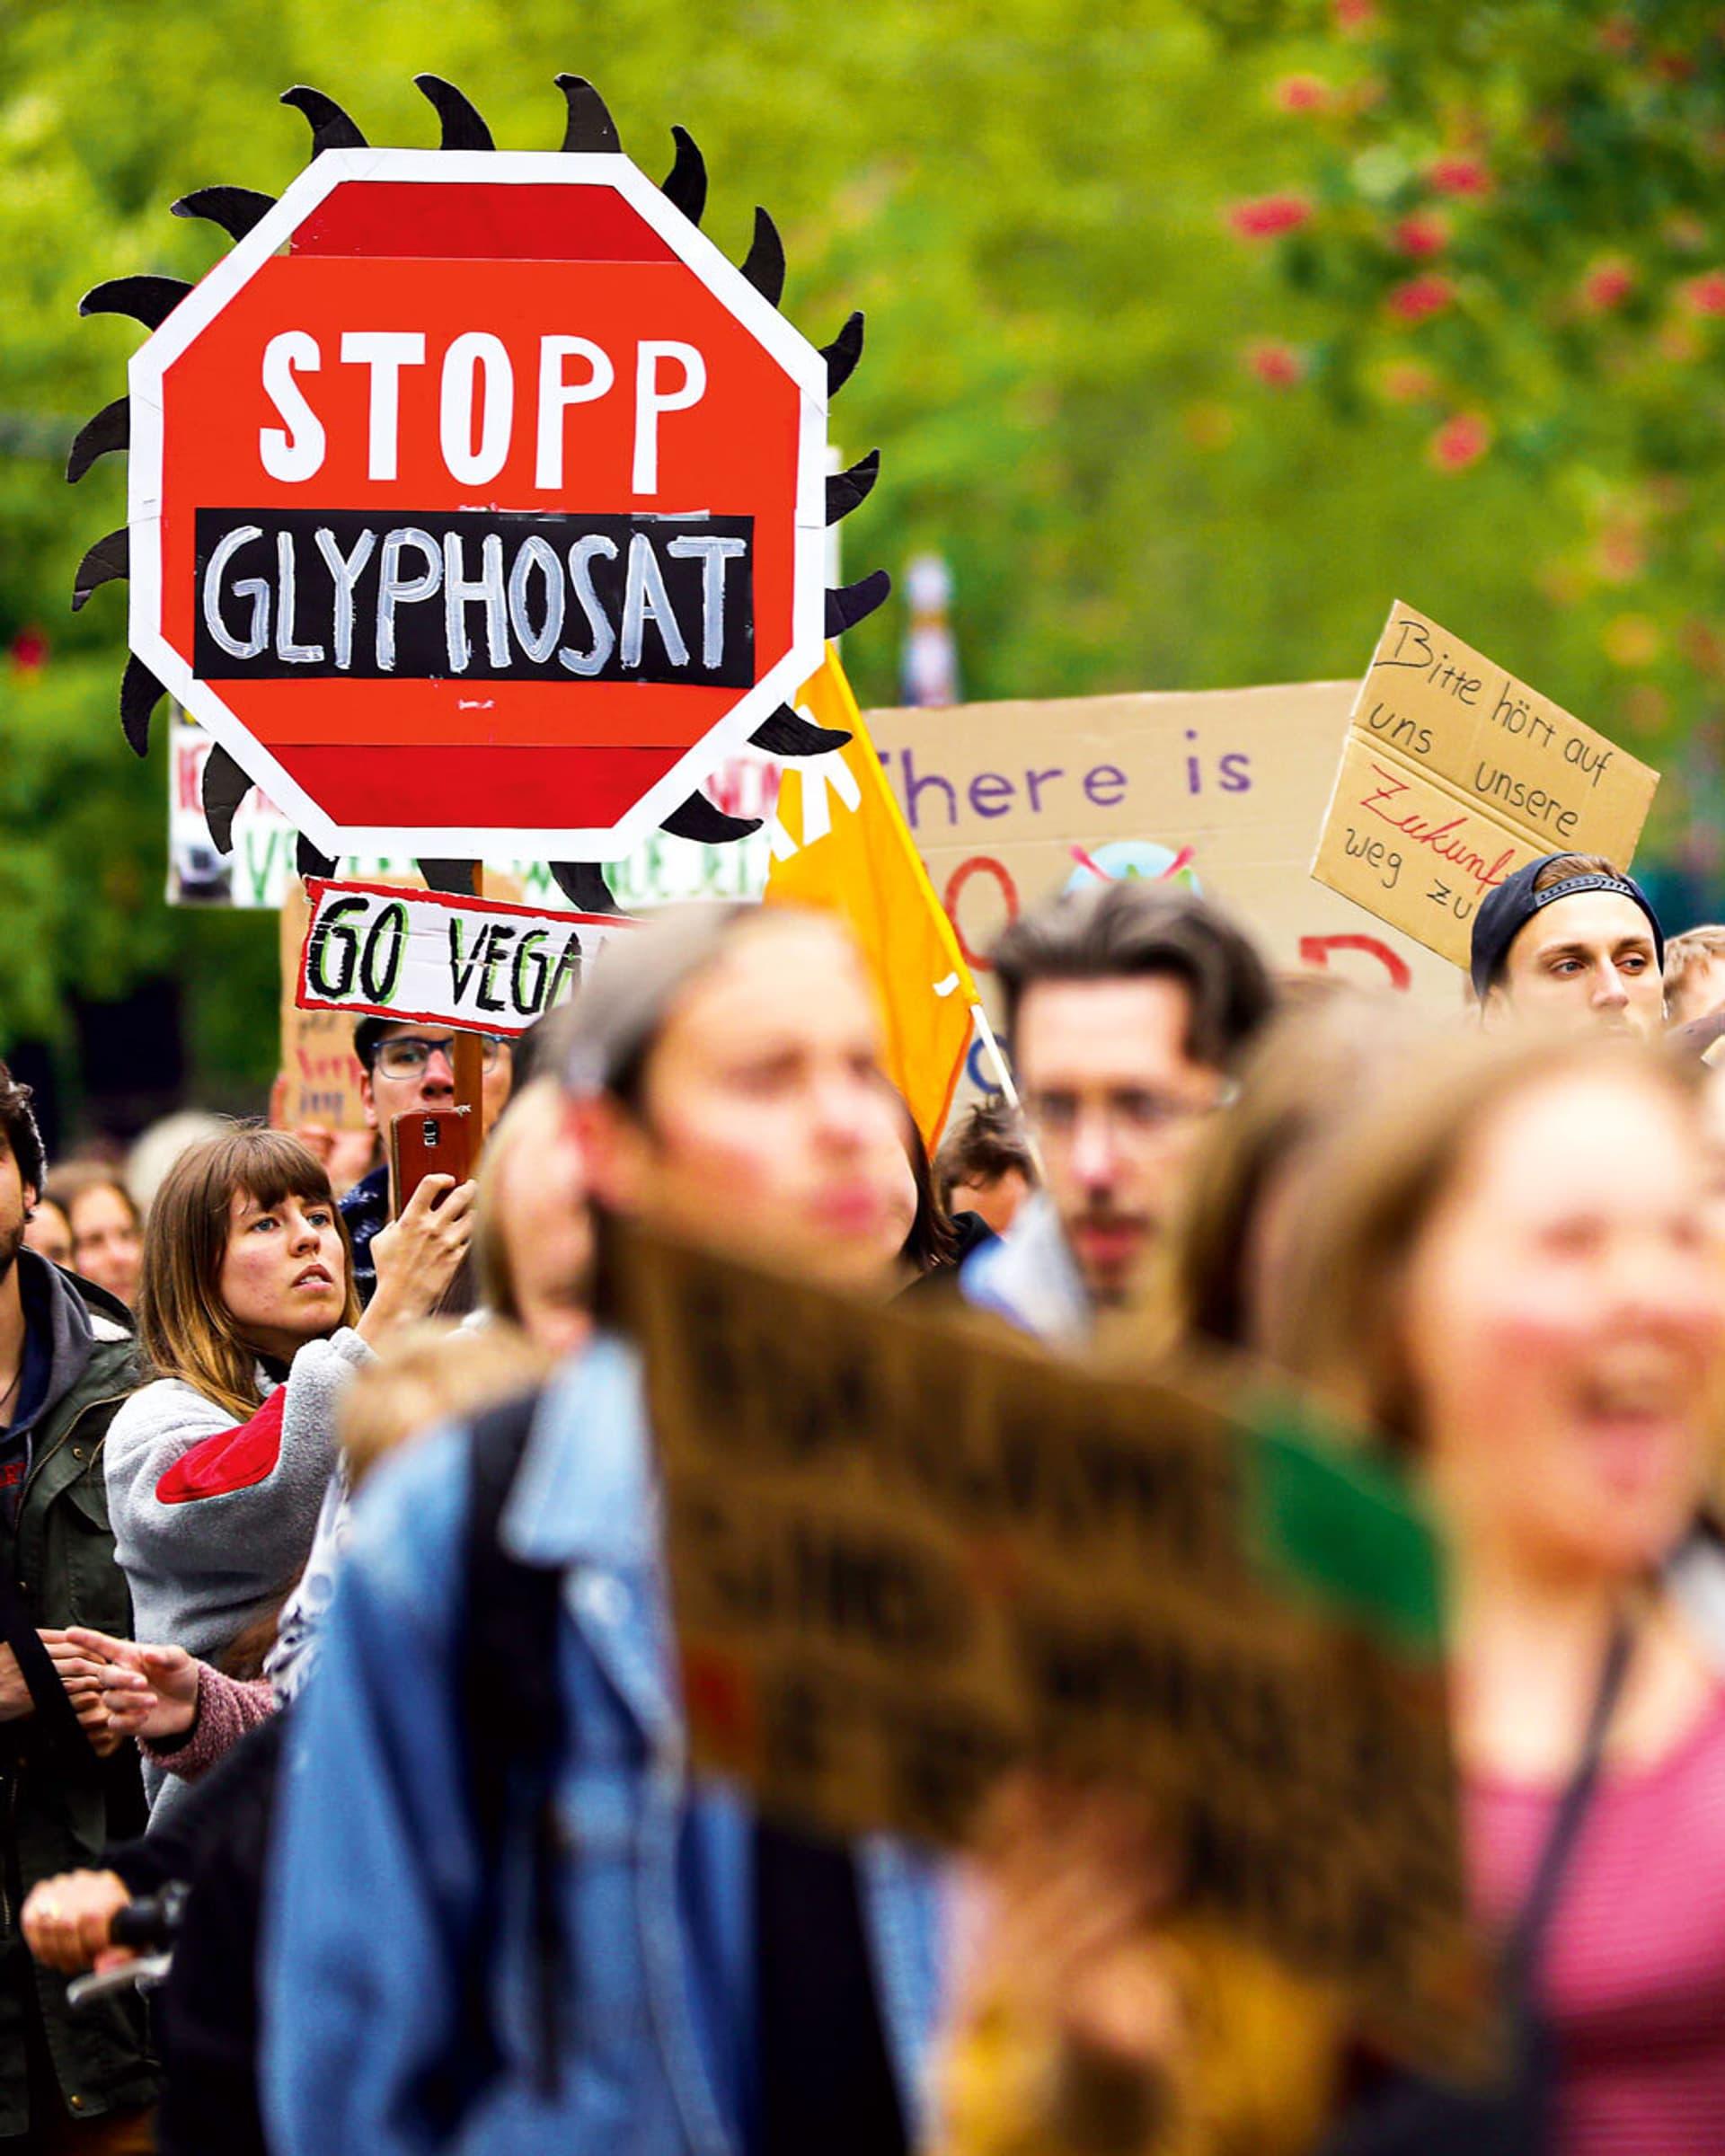 Demo Glyphosat